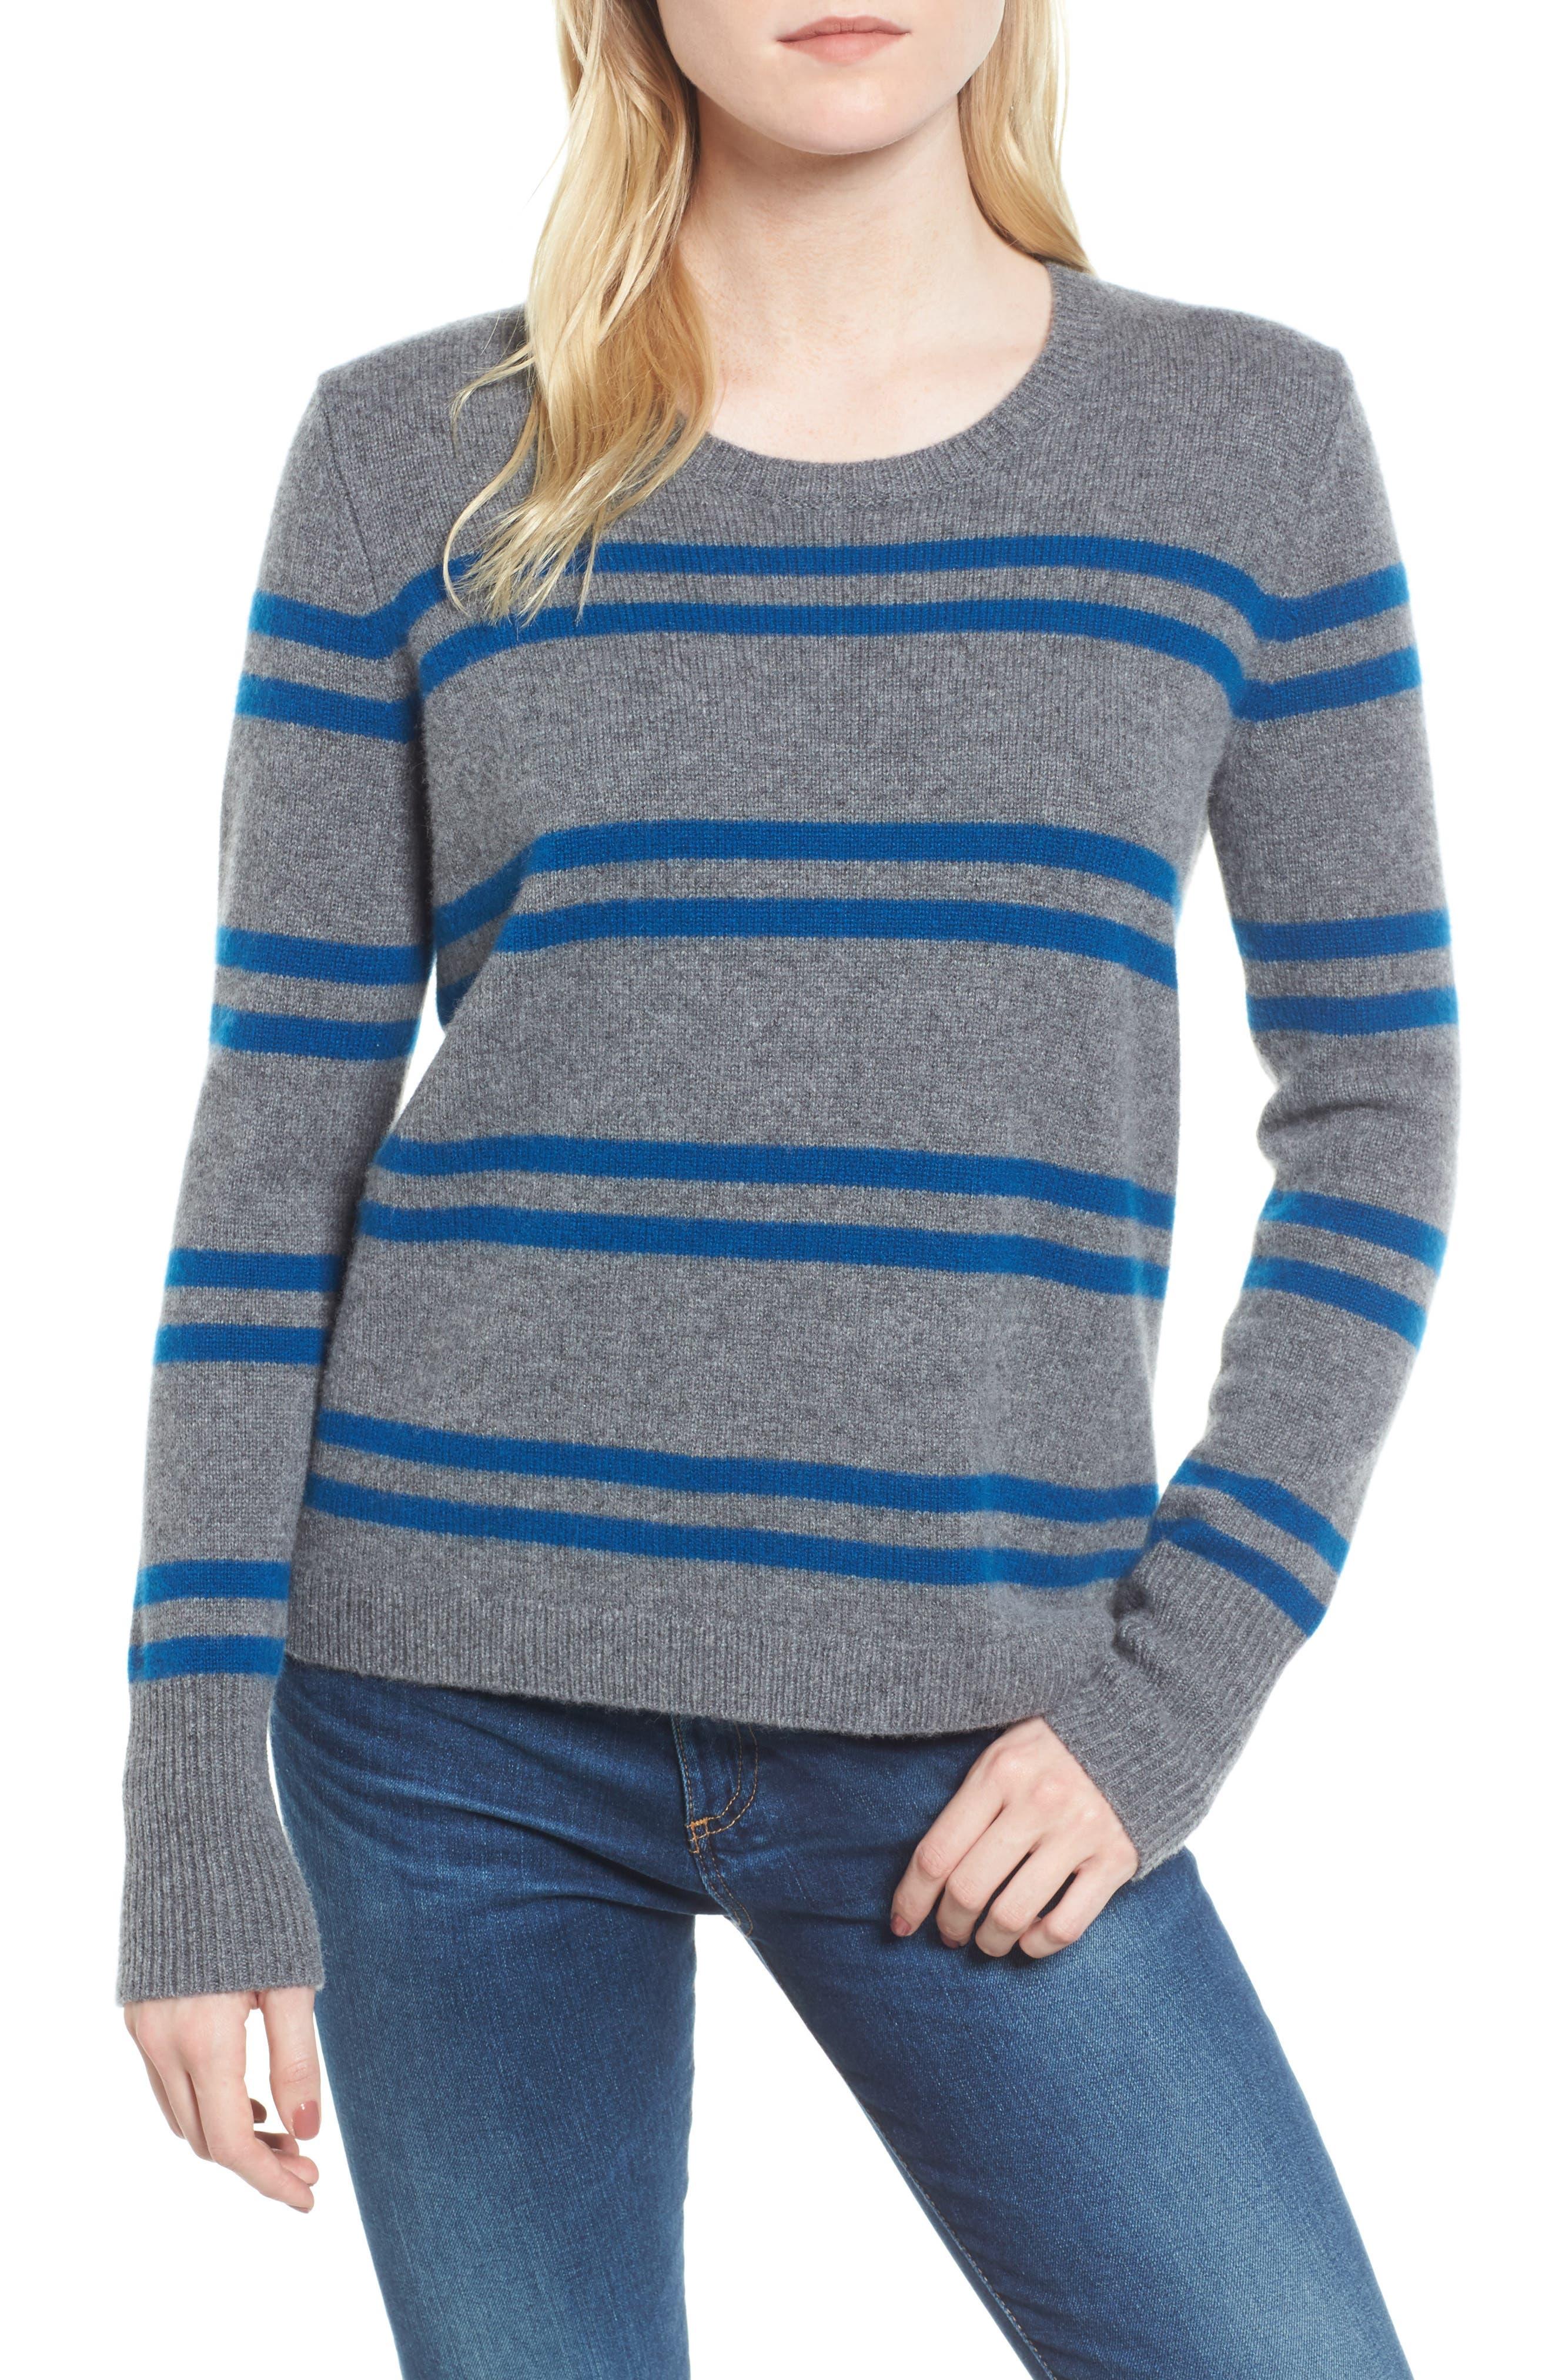 Stripe Cashmere Sweatshirt,                         Main,                         color, Heather Grey/ Ocean